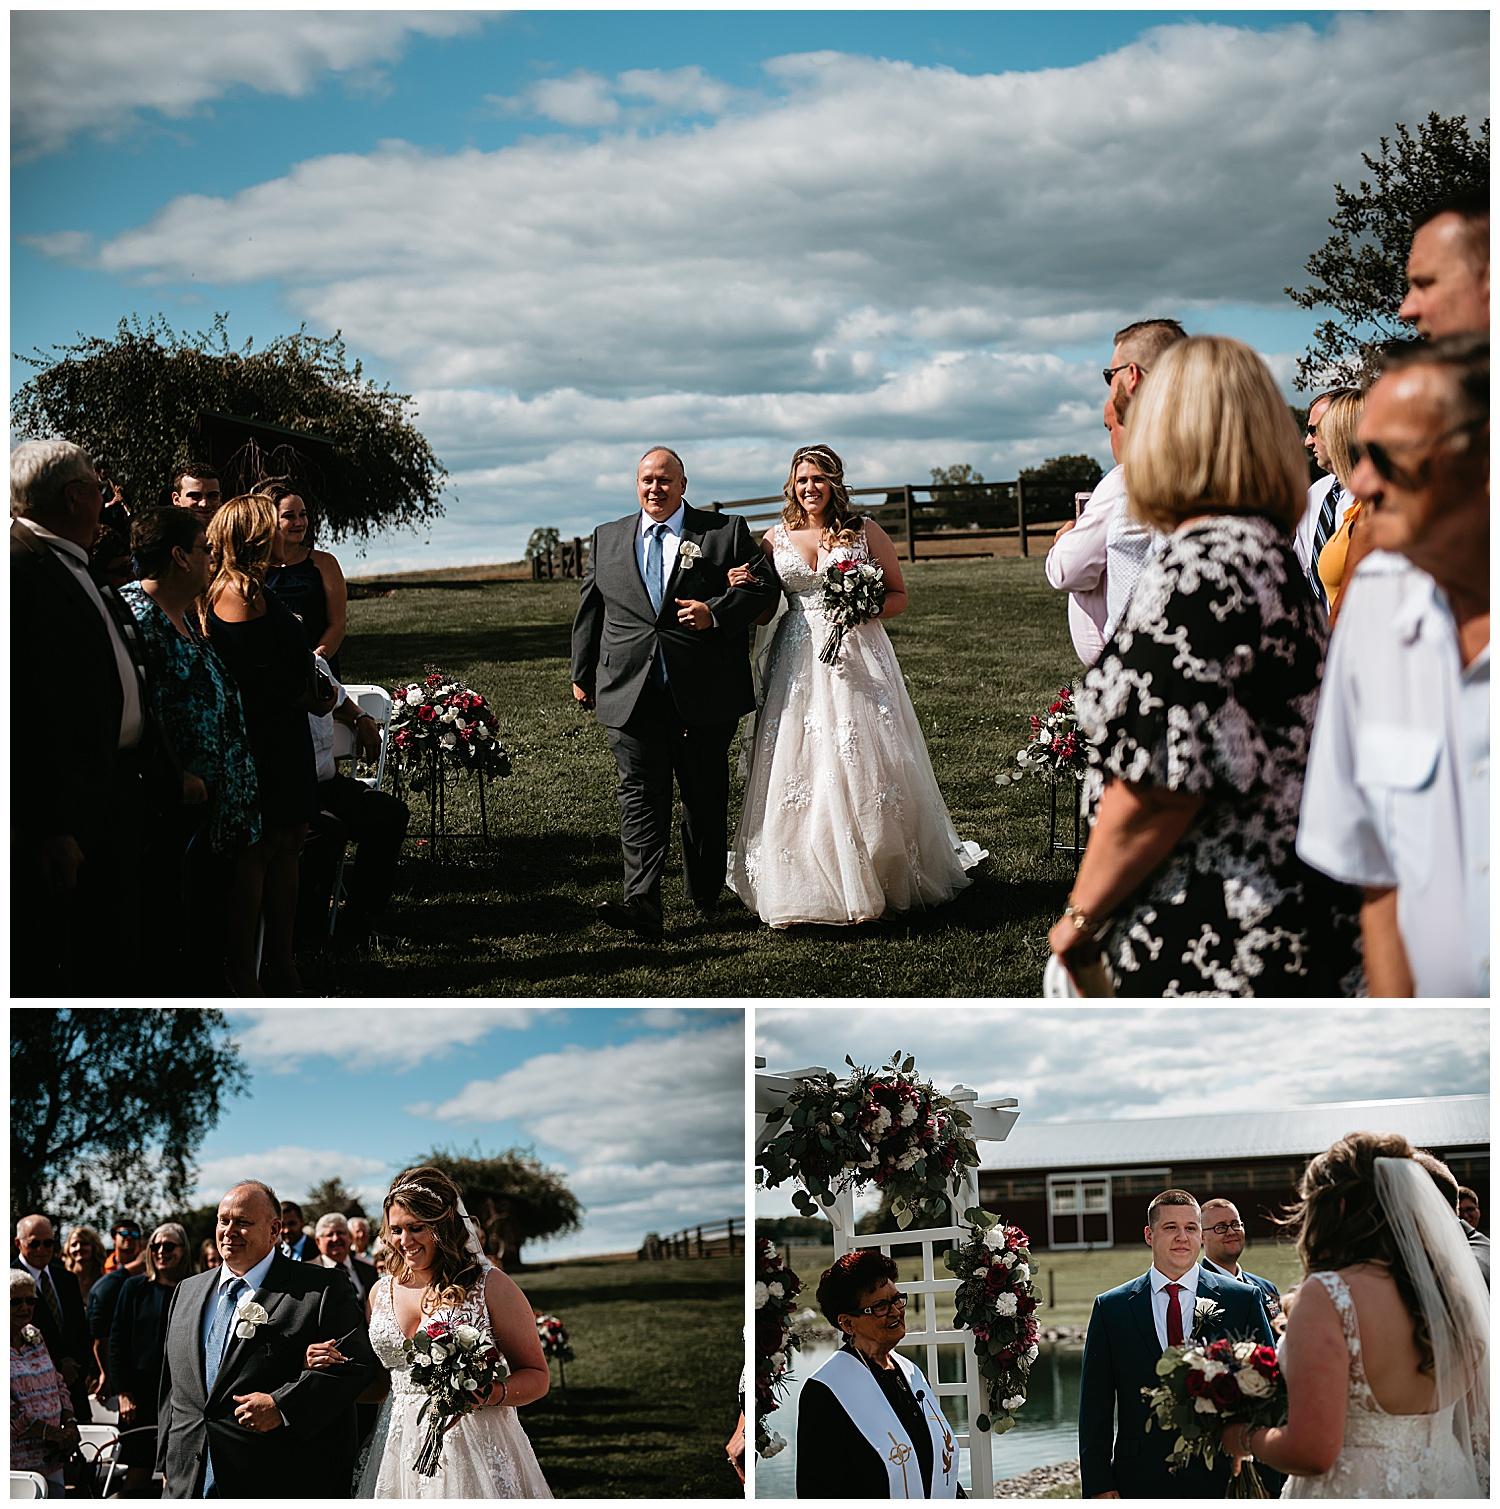 NEPA-Bloomgsburg-Wedding-Photographer-at-The-Barn-at-Greystone-Farms-Watsontown-PA_0061.jpg